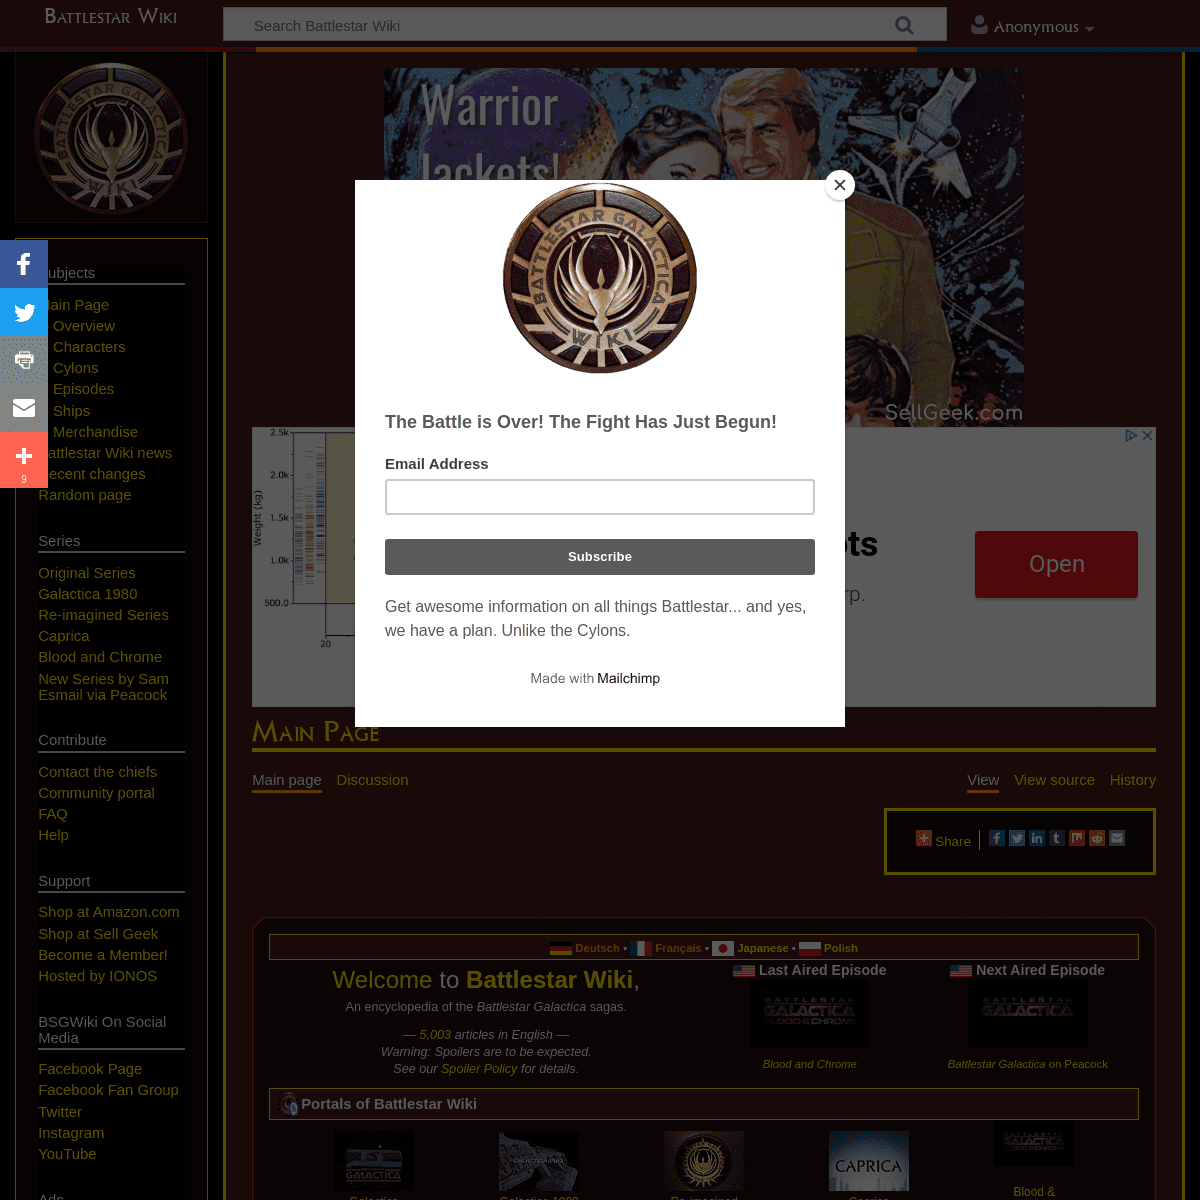 Battlestar Wiki